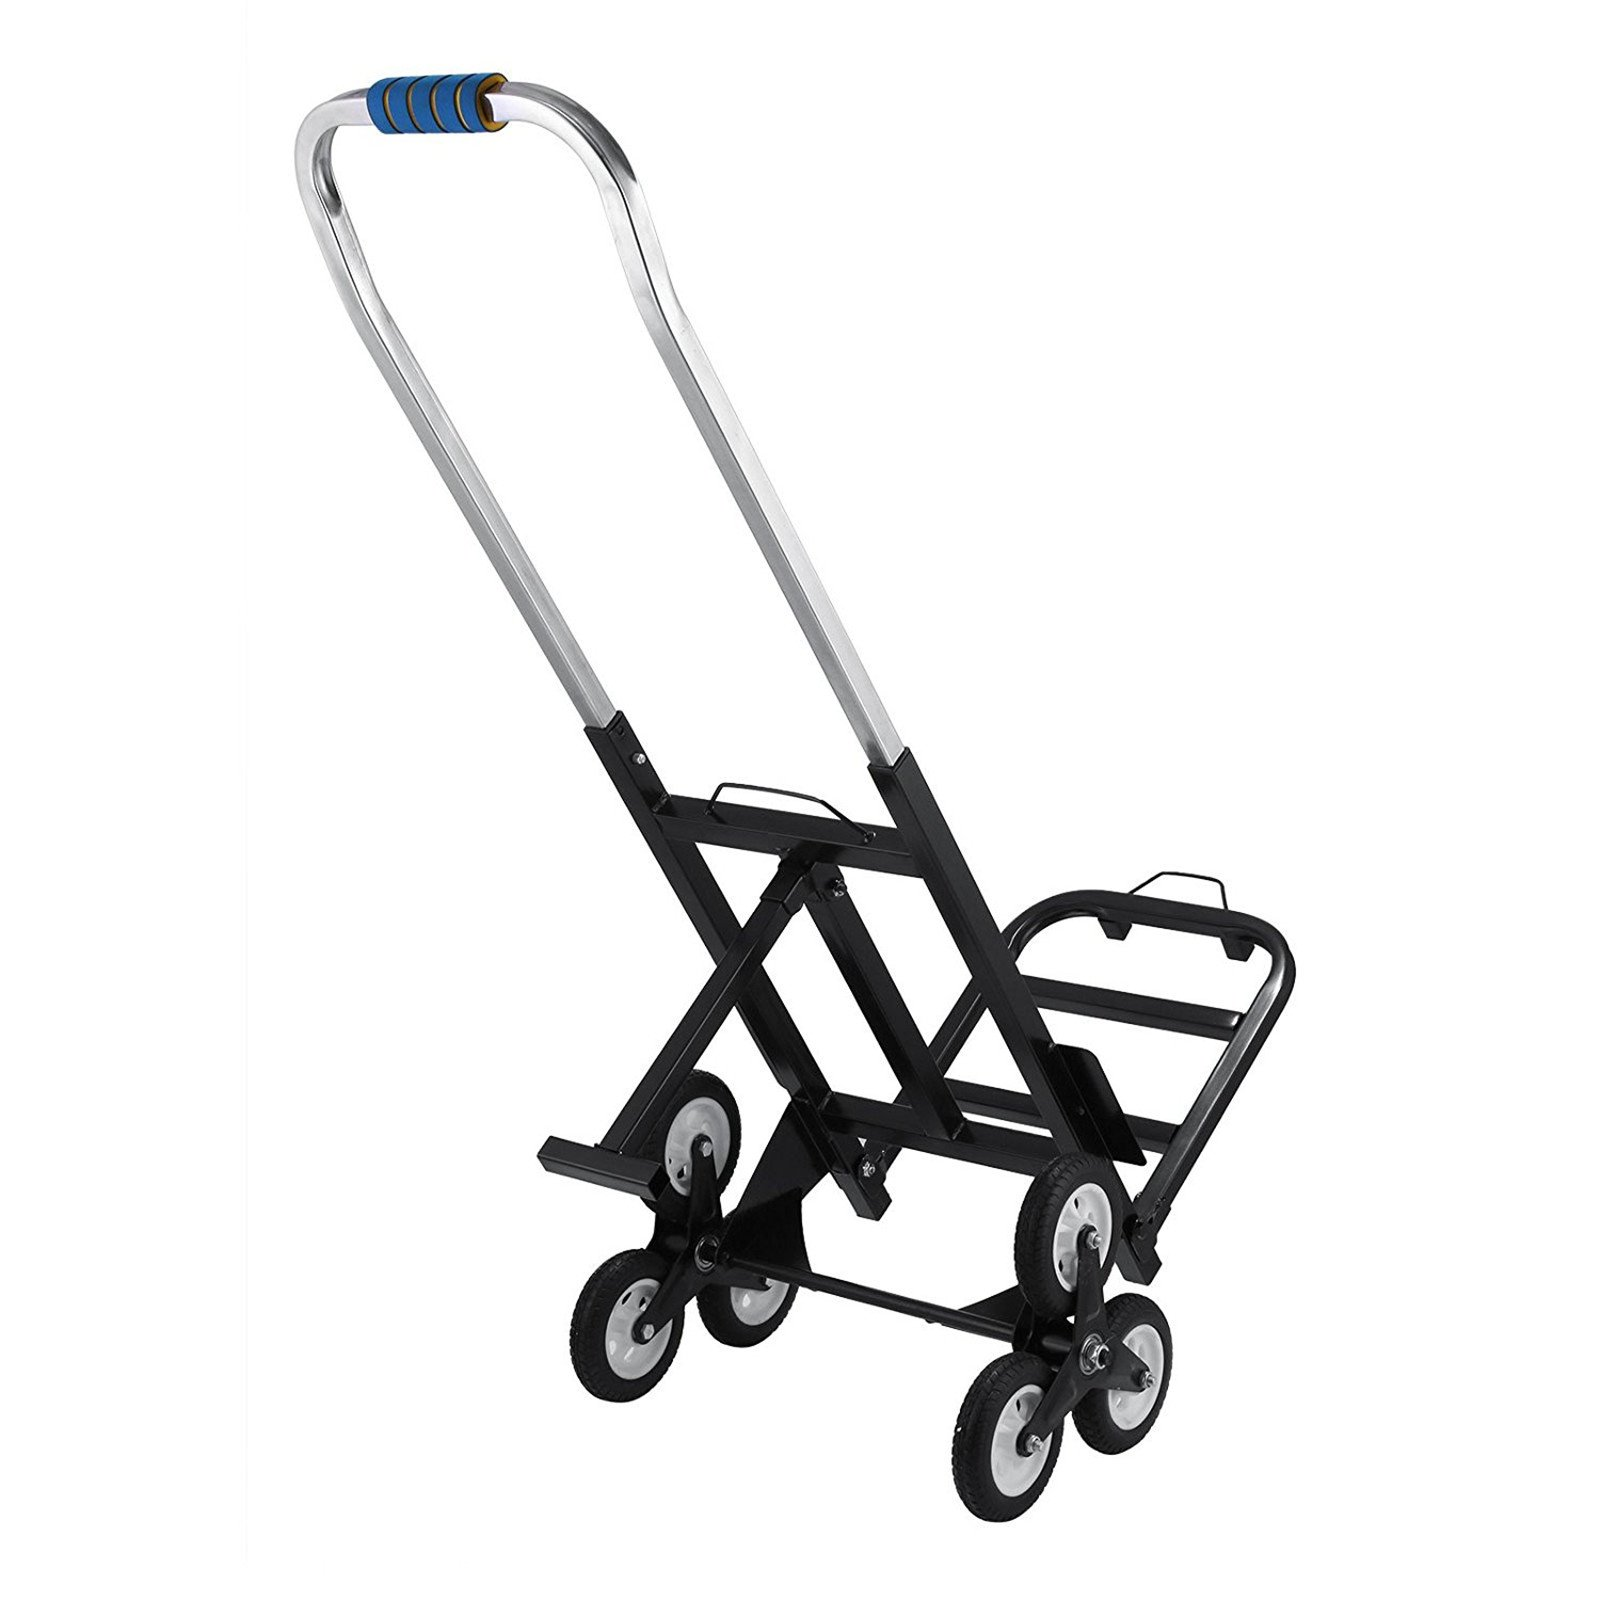 Z-bond 420 LBS Capacity Stair Climber Cart 30 Inch All Terrain Stair Climbing Hand Truck Folding Stair Hand Truck Heavy Duty with 6 Wheels